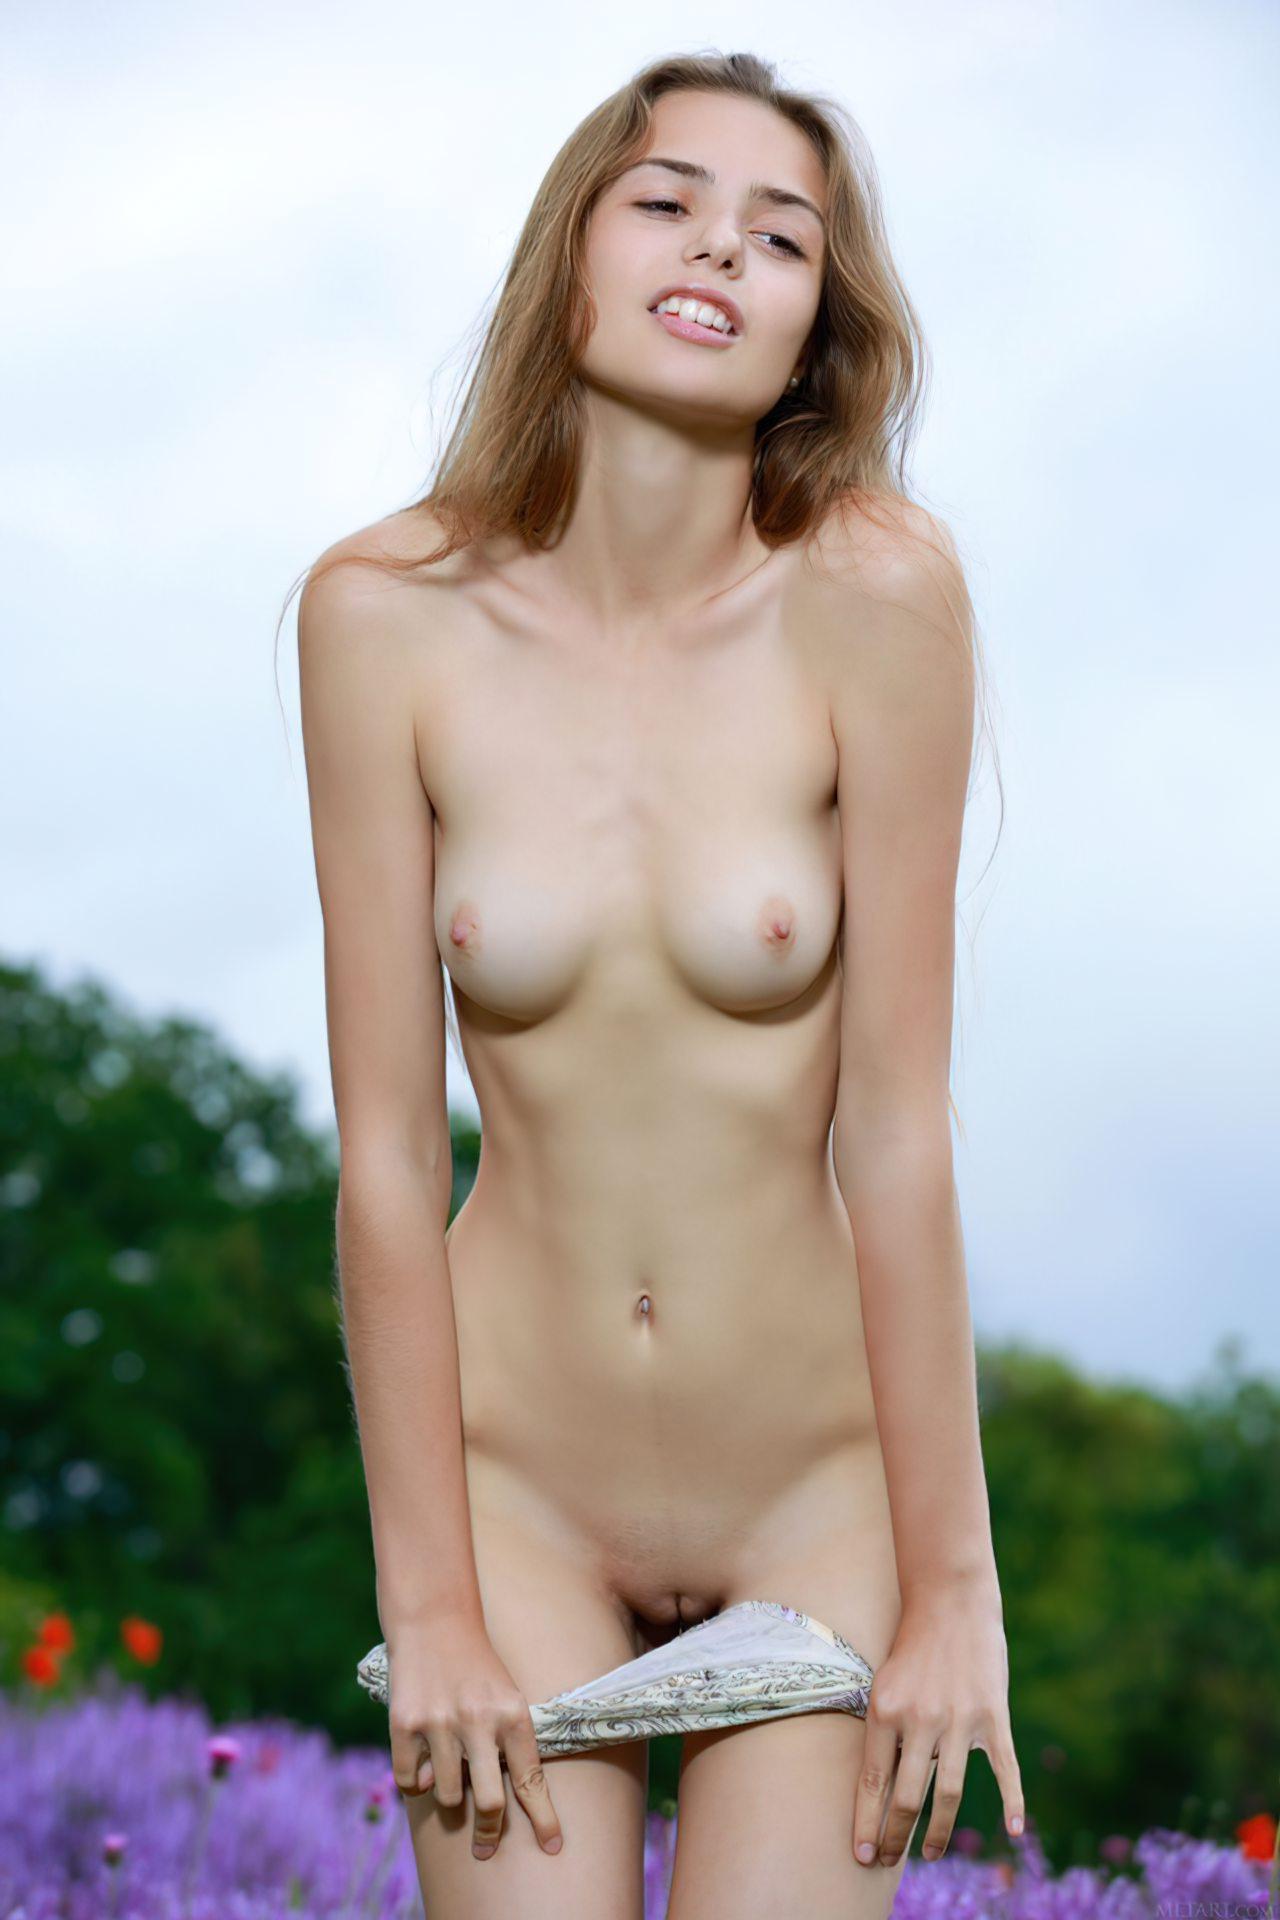 Mulheres Despidas (28)